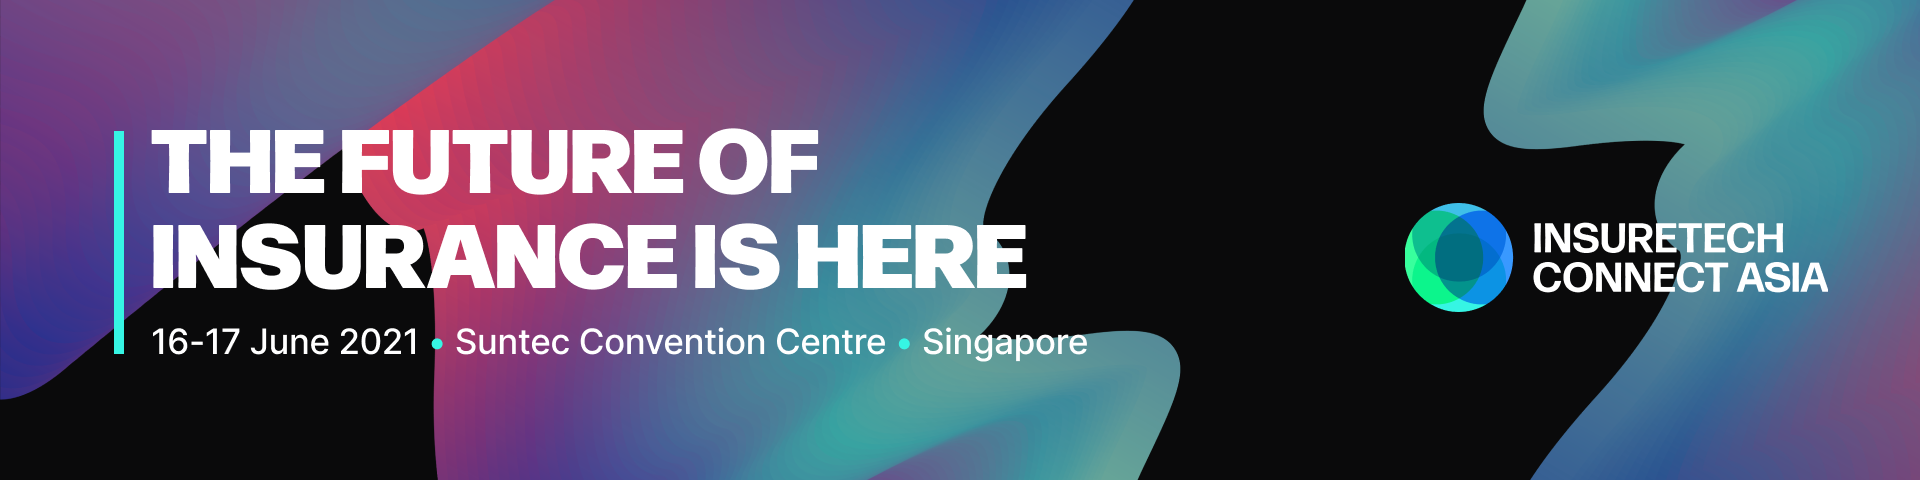 InsureTech Connect Asia 2021 Banner Image